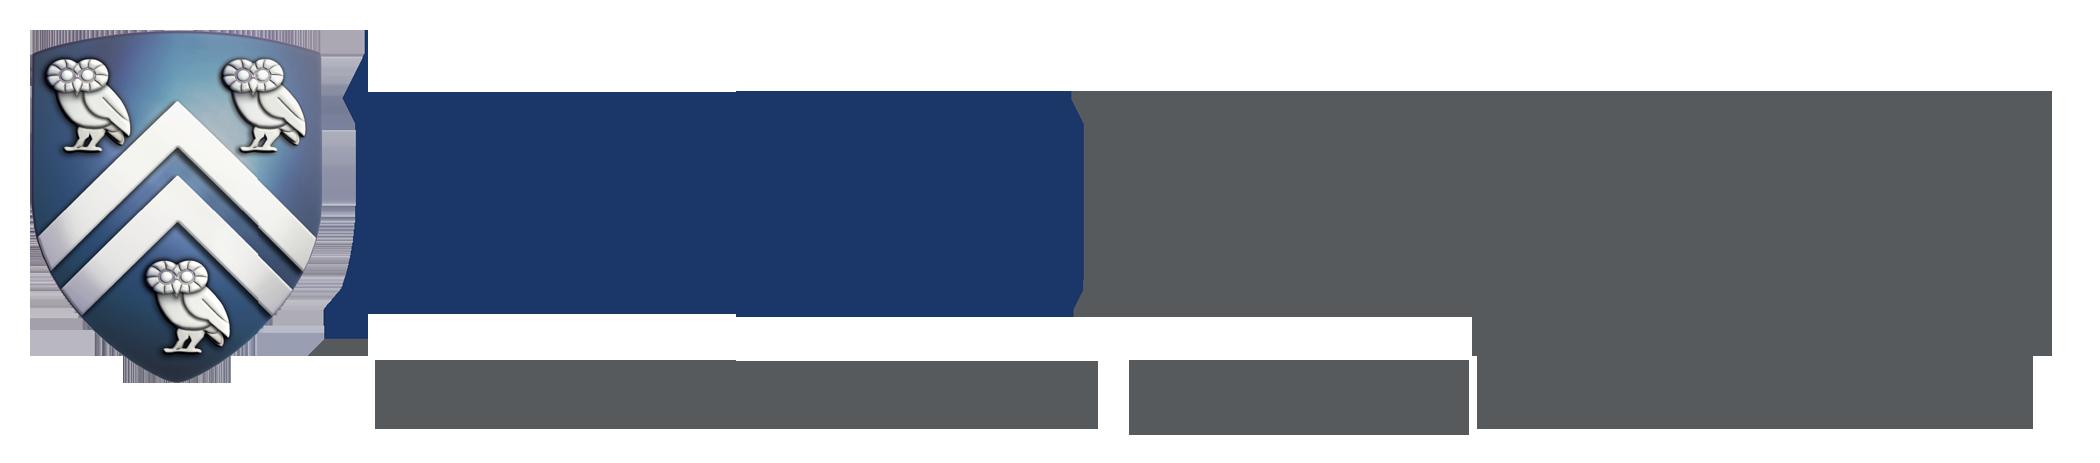 Rice-I-RCQM-logo_1_